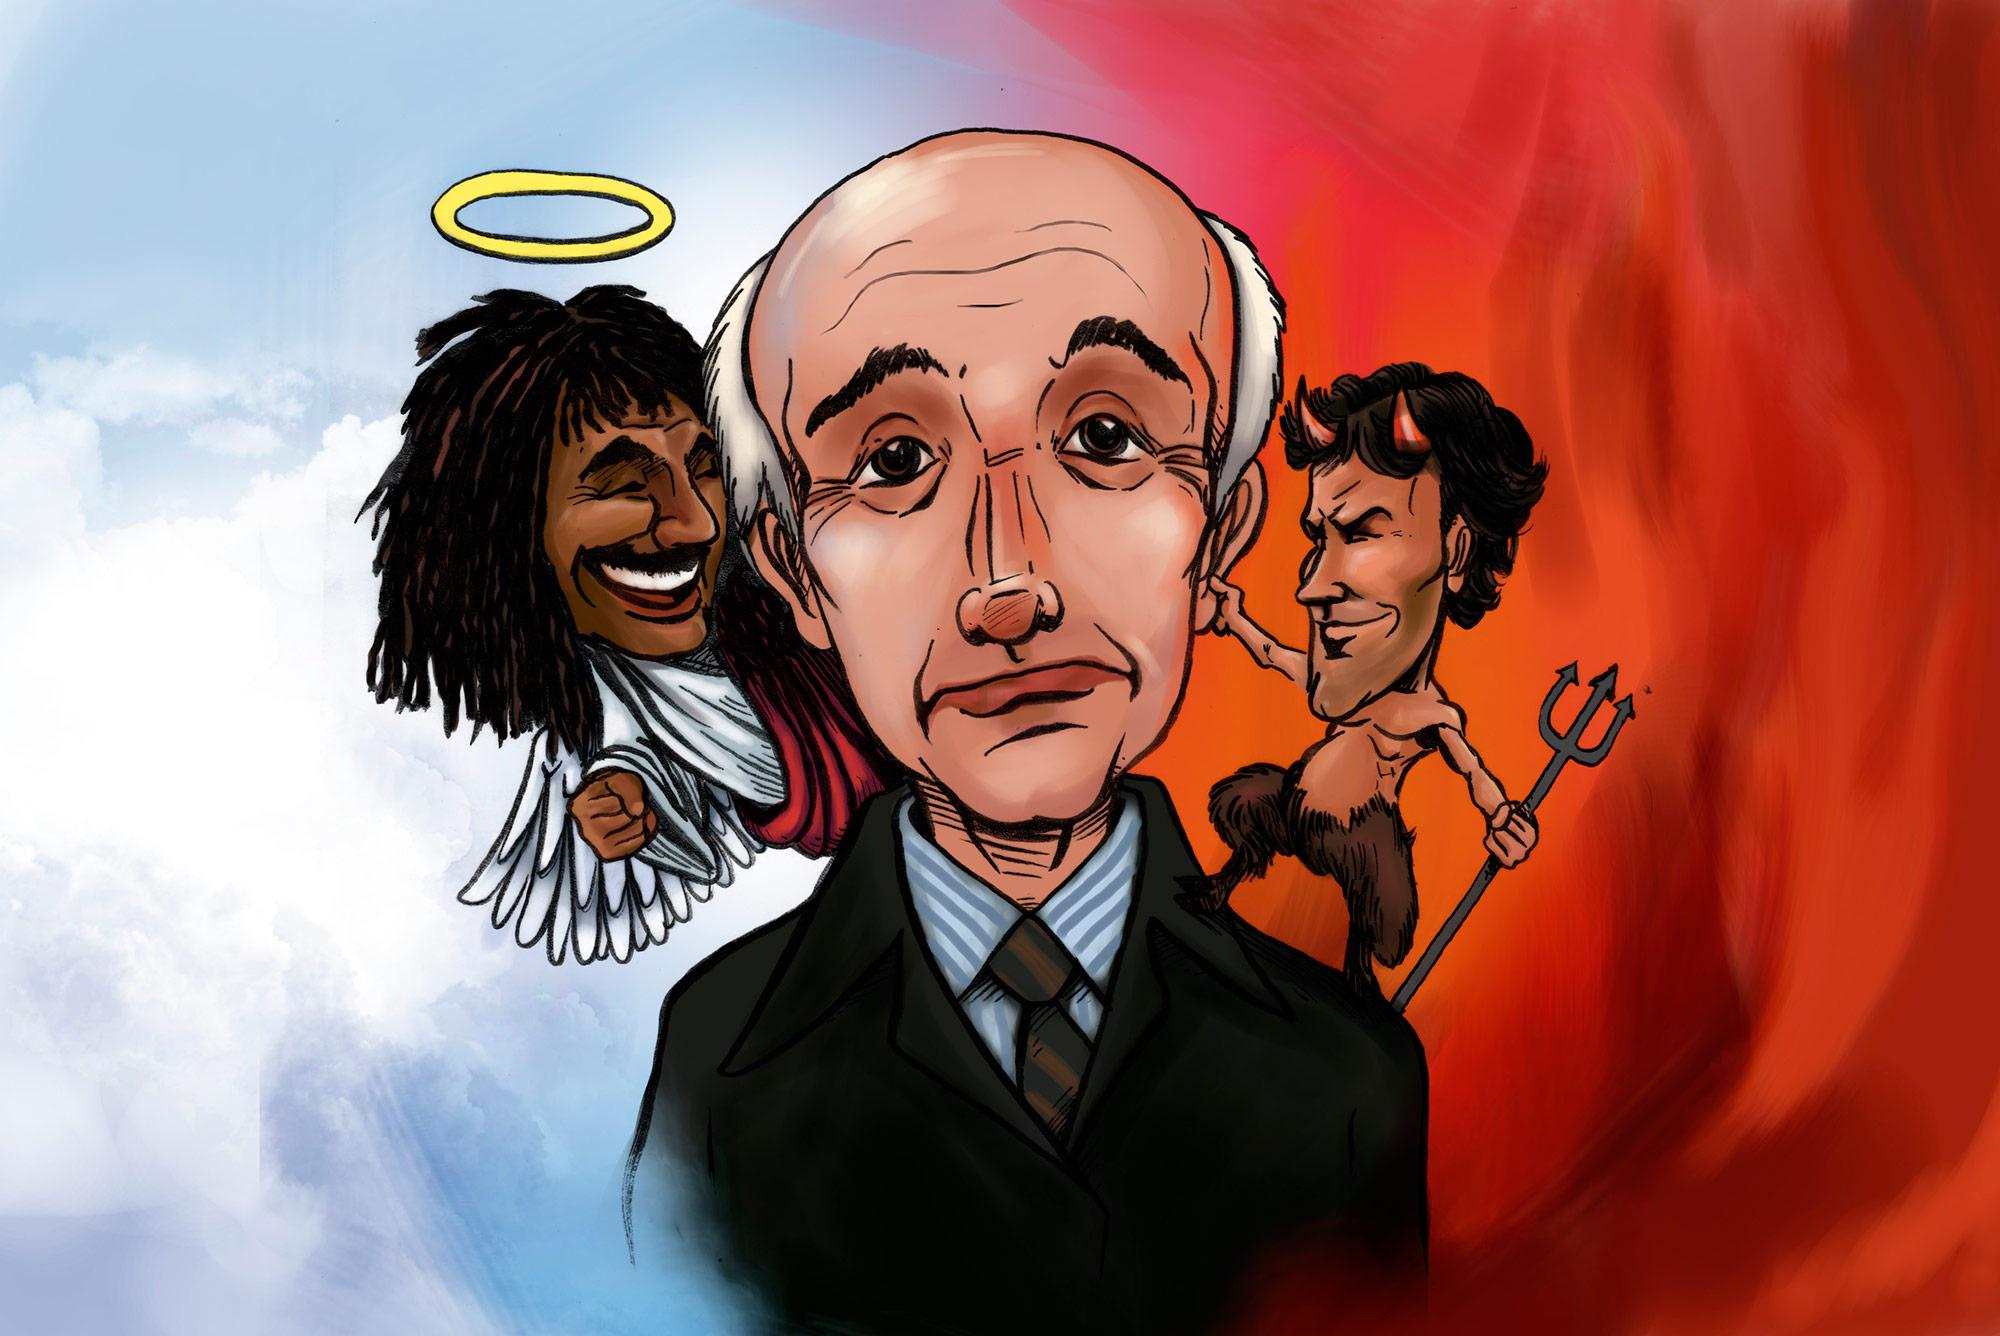 Caricatura Sacchi, Gullit y Van Basten